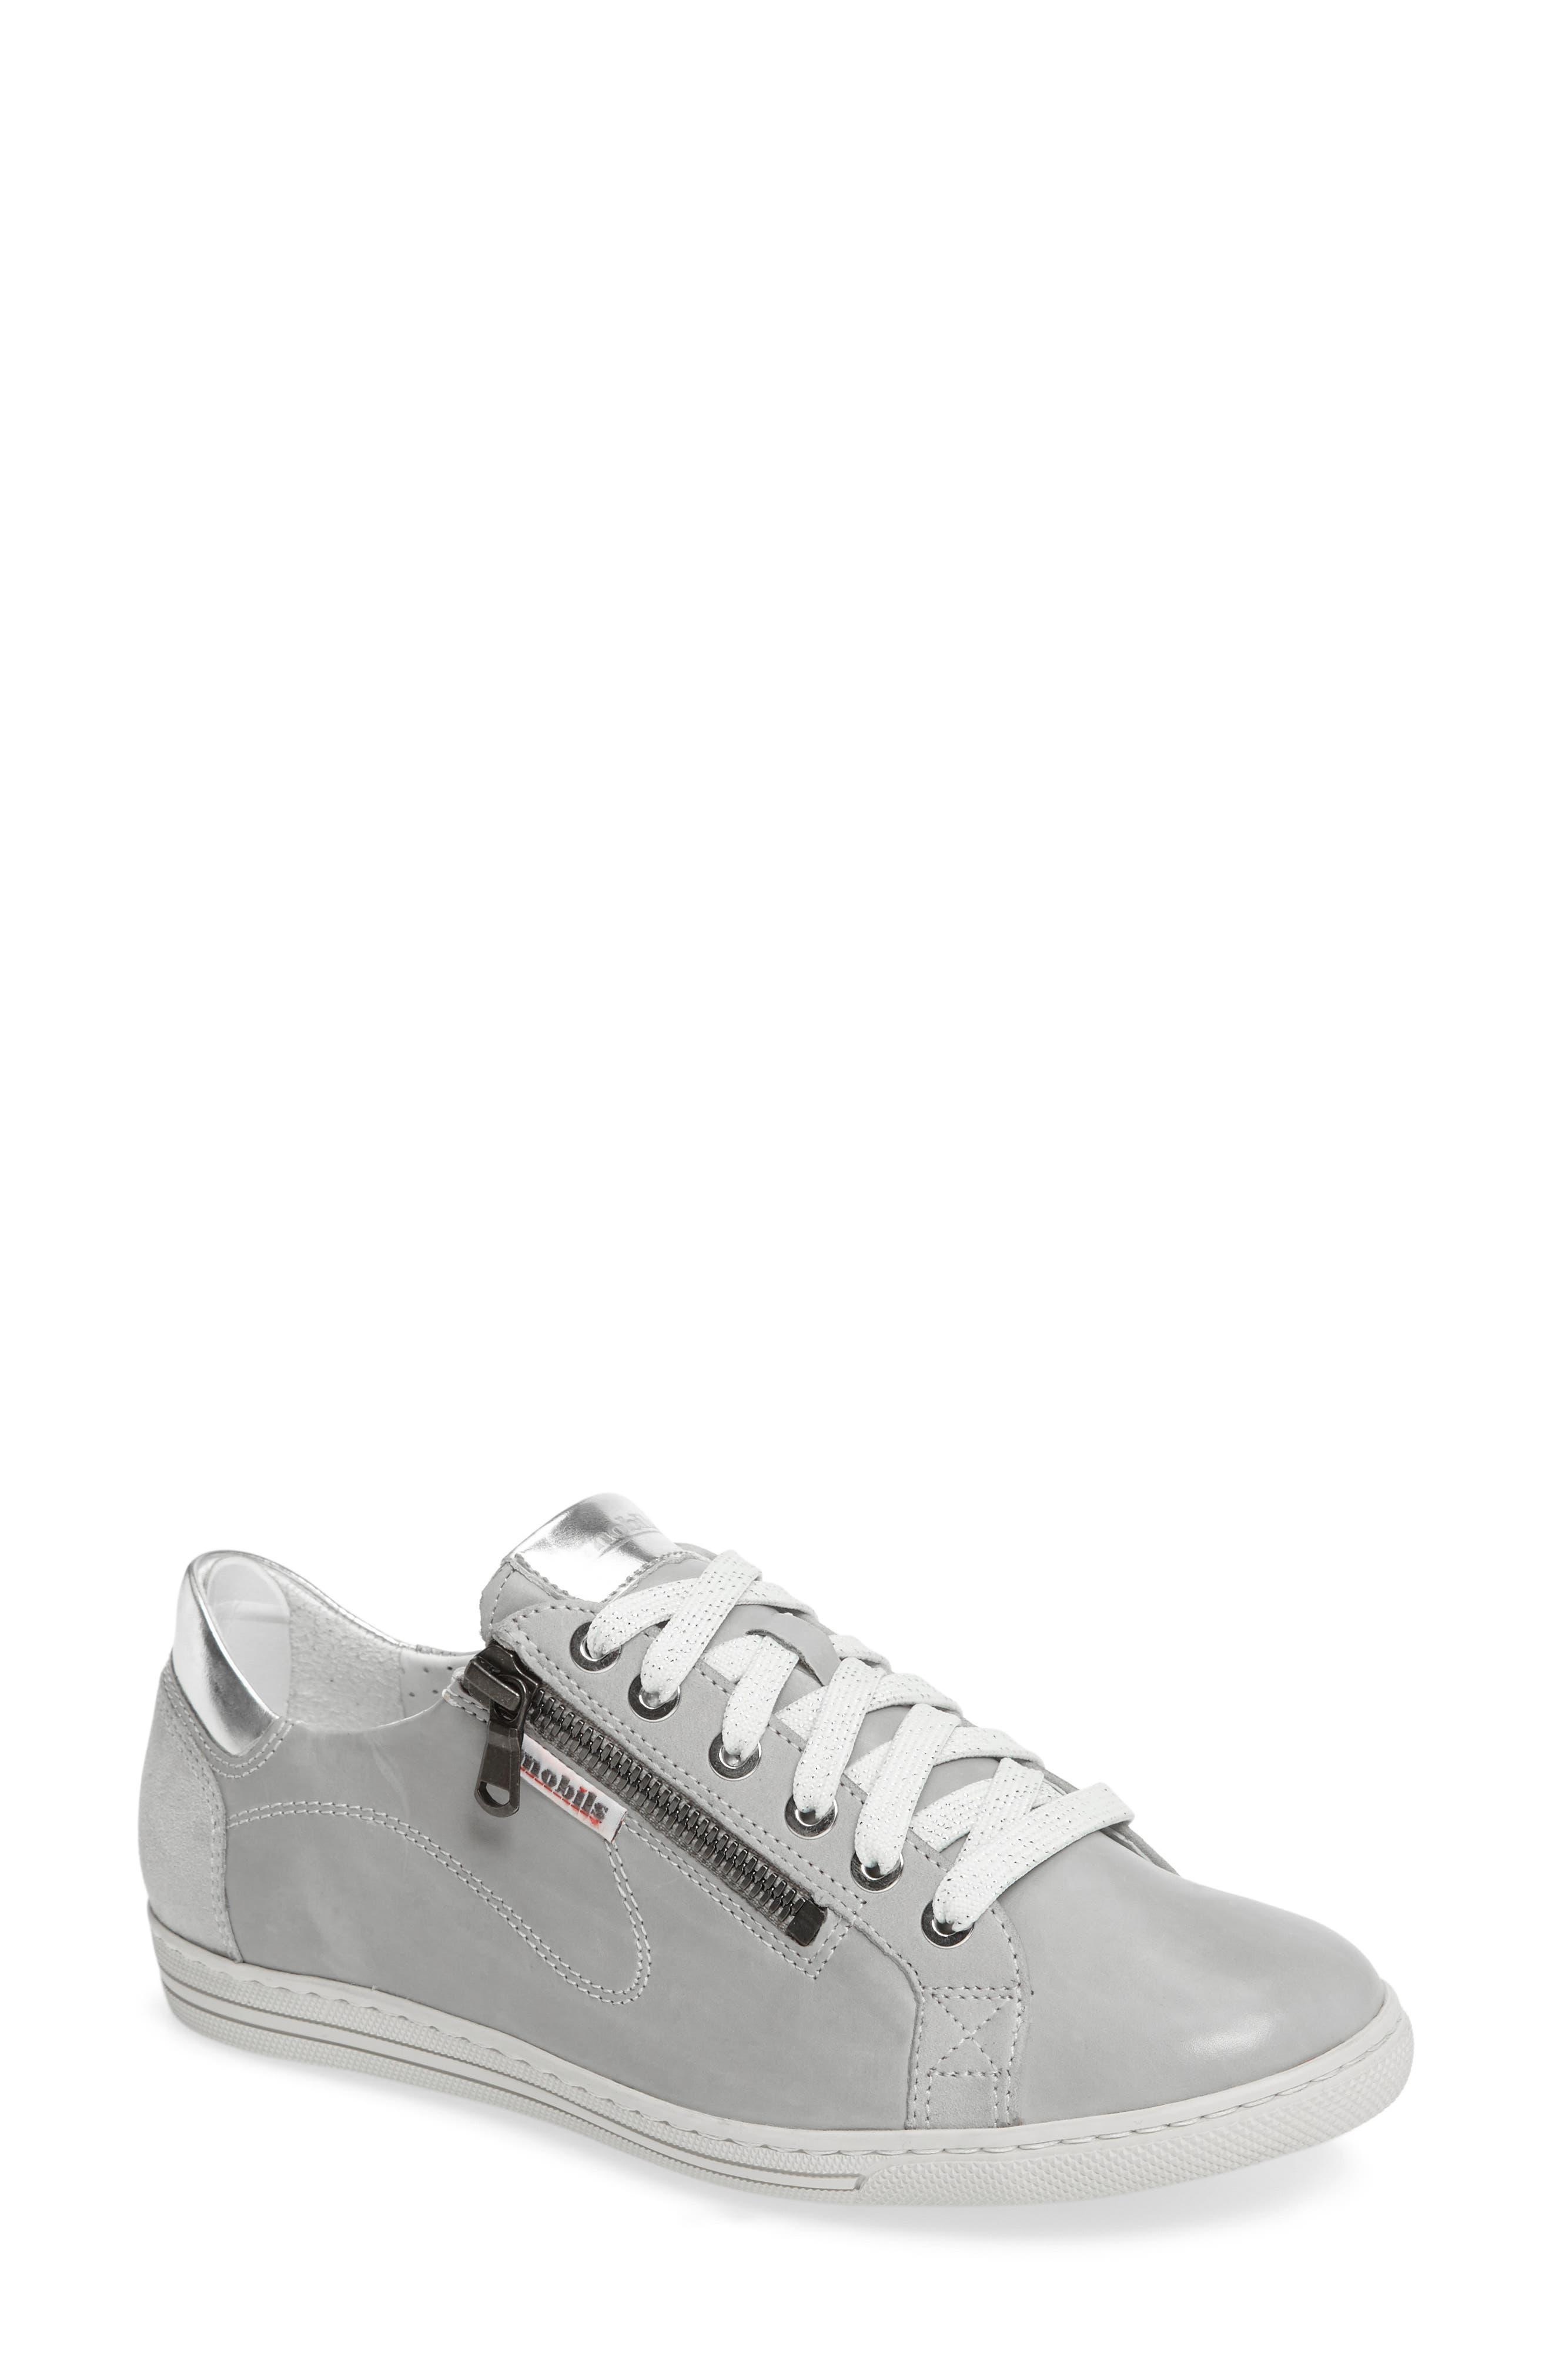 Hawai Sneaker,                             Main thumbnail 1, color,                             Light Grey Calfskin Leather